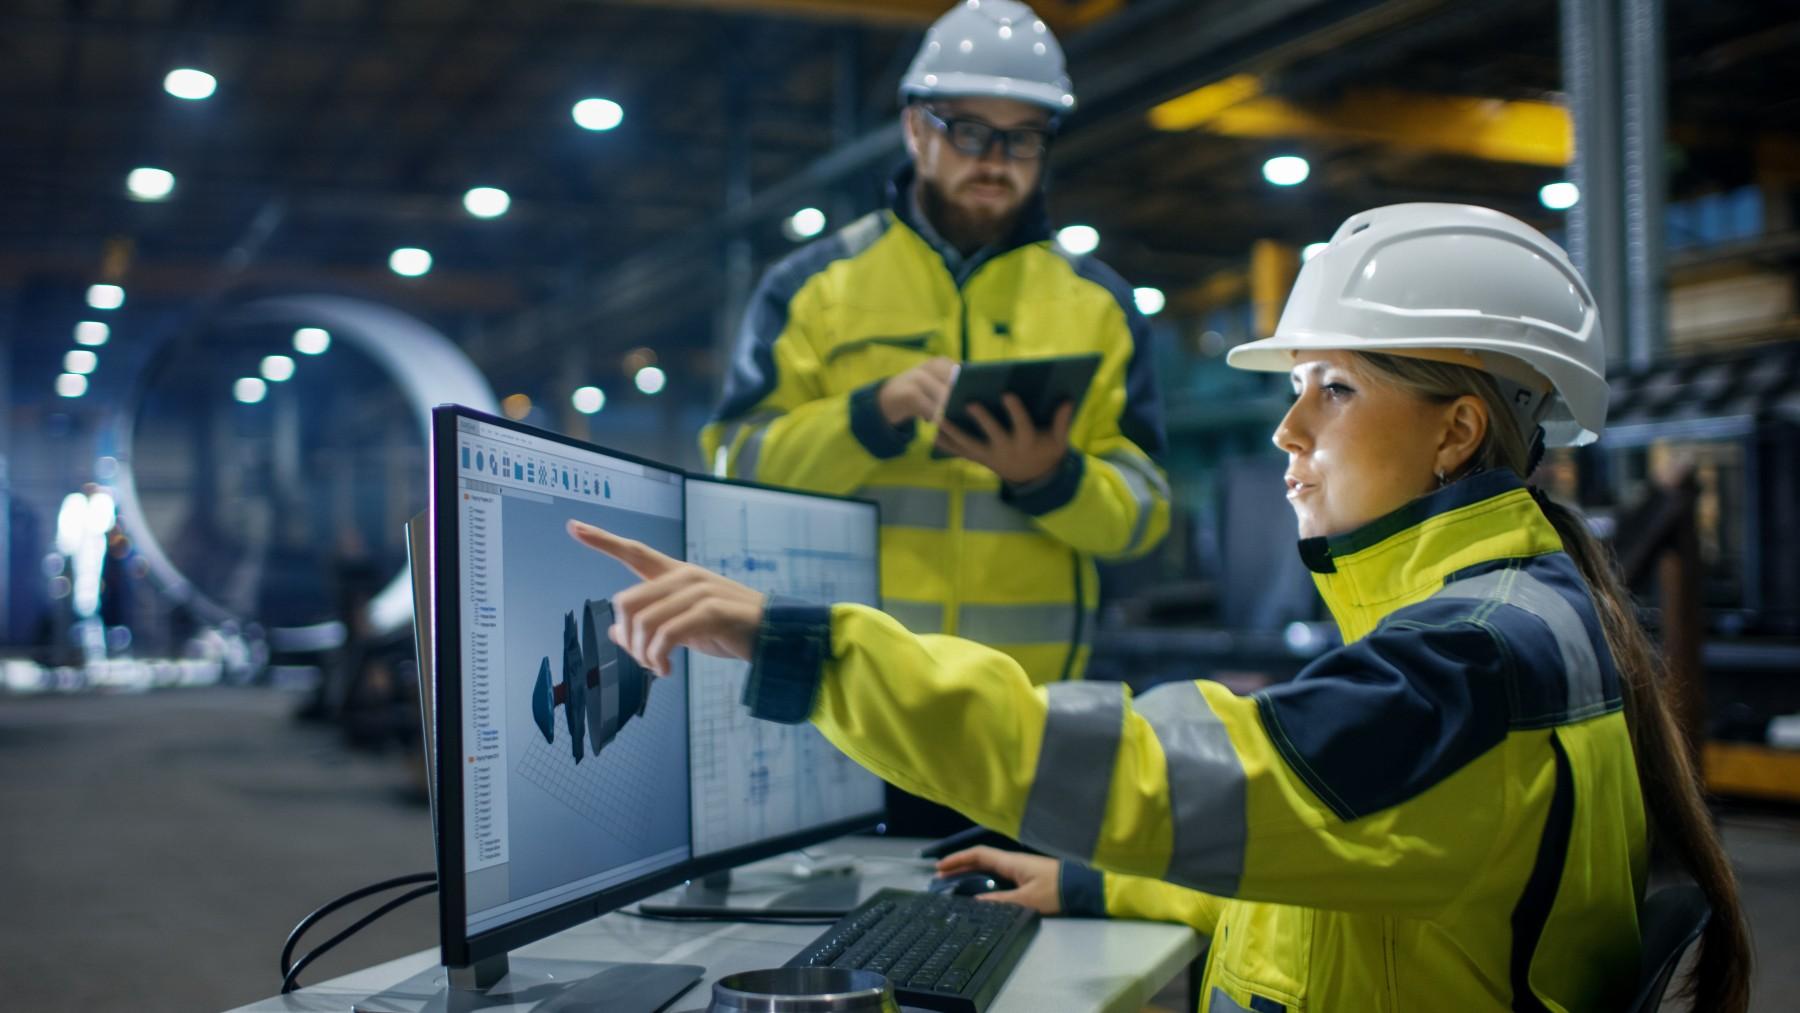 woman working in industrial job in Spain